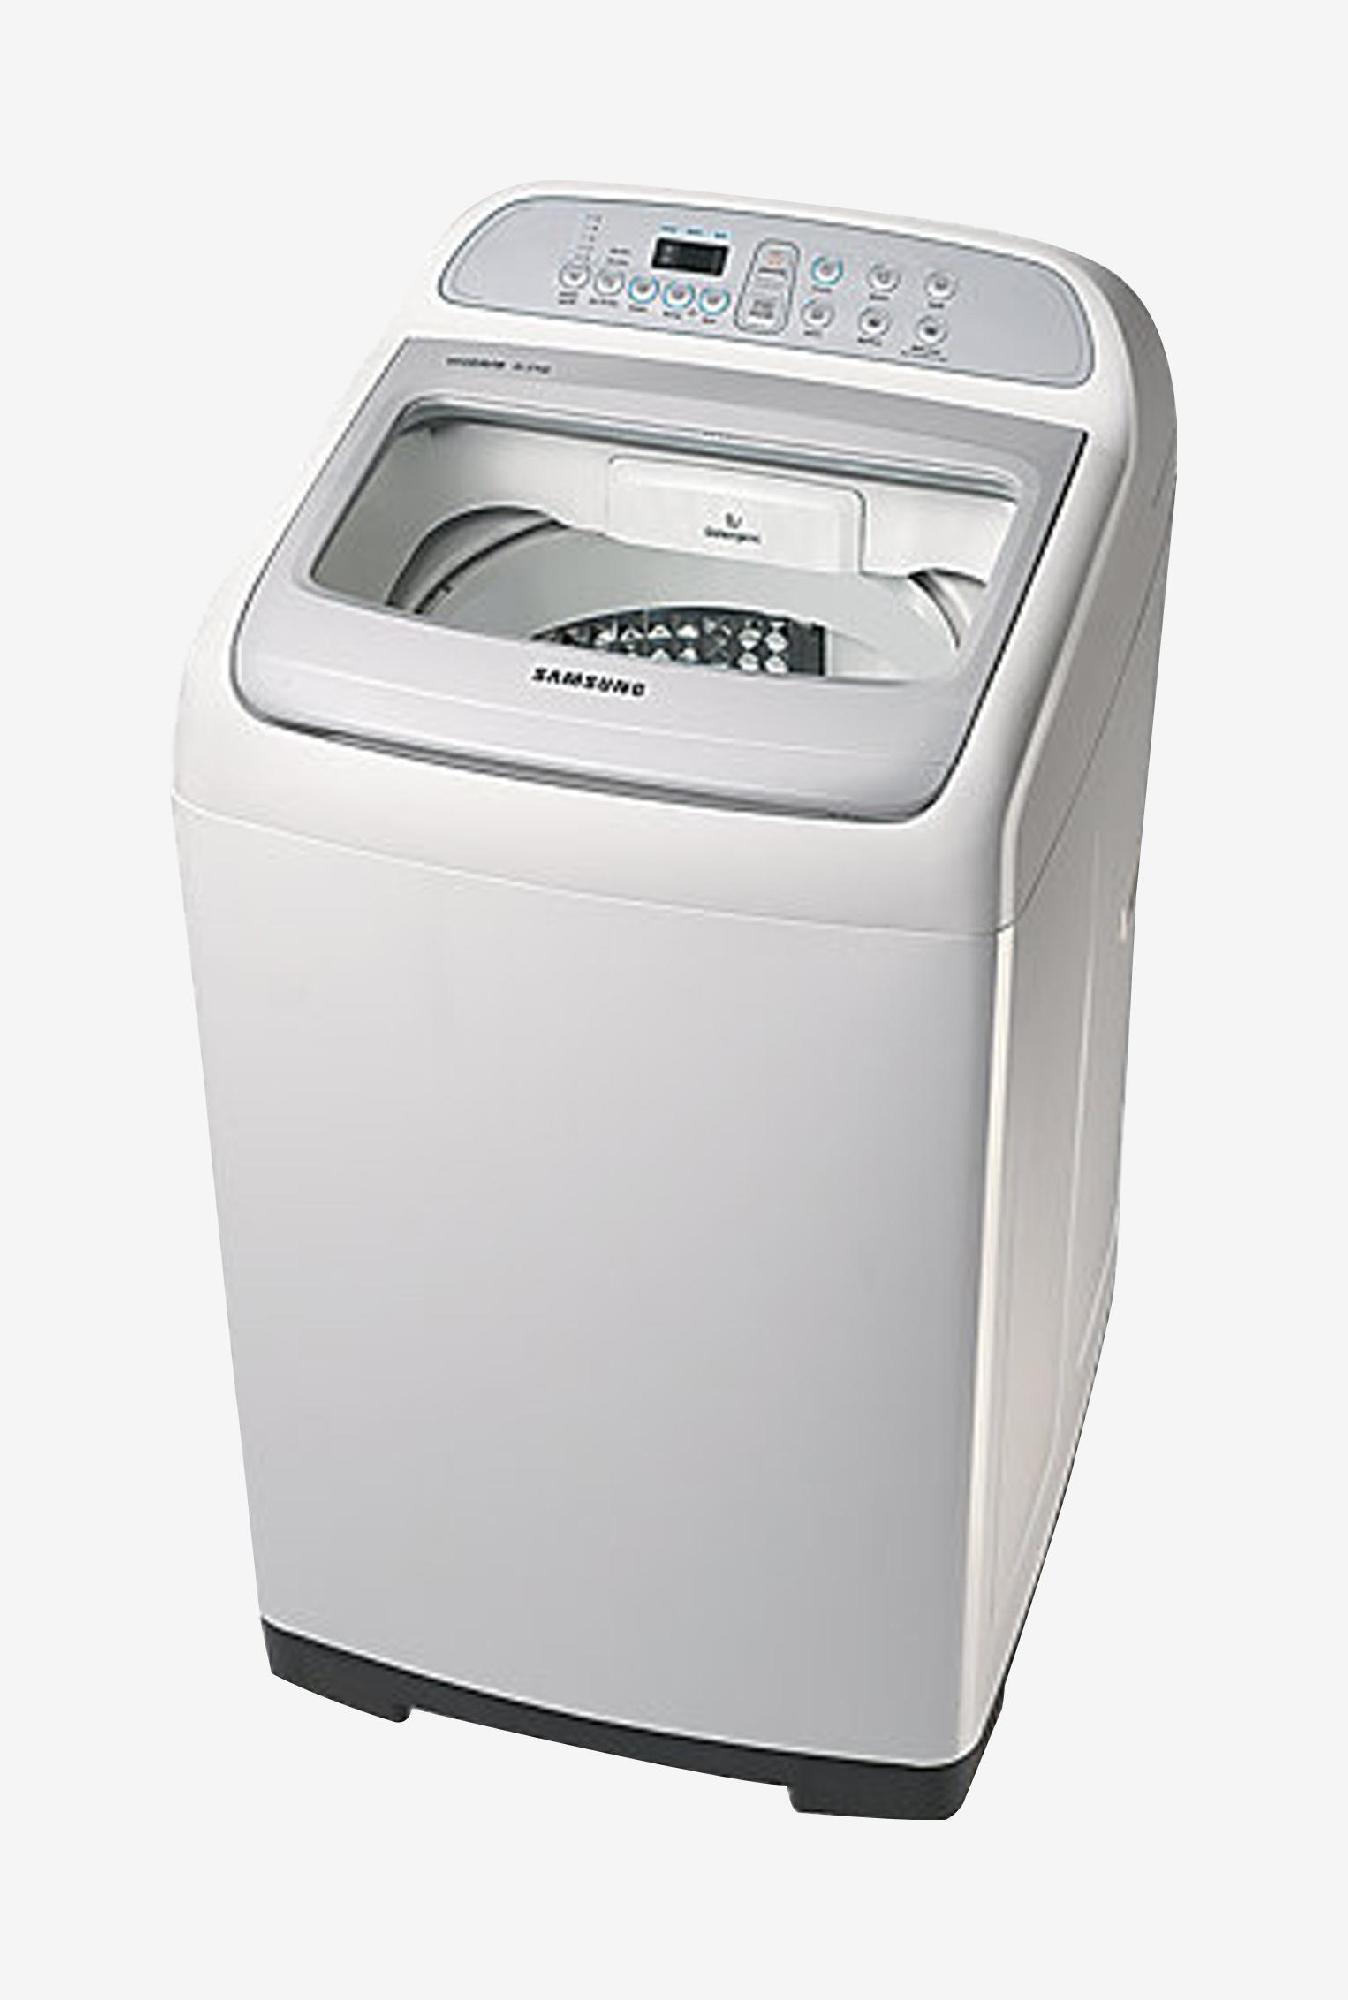 Samsung WA62H4200HY 6.2Kg Fully Automatic Top Load Washing Machine